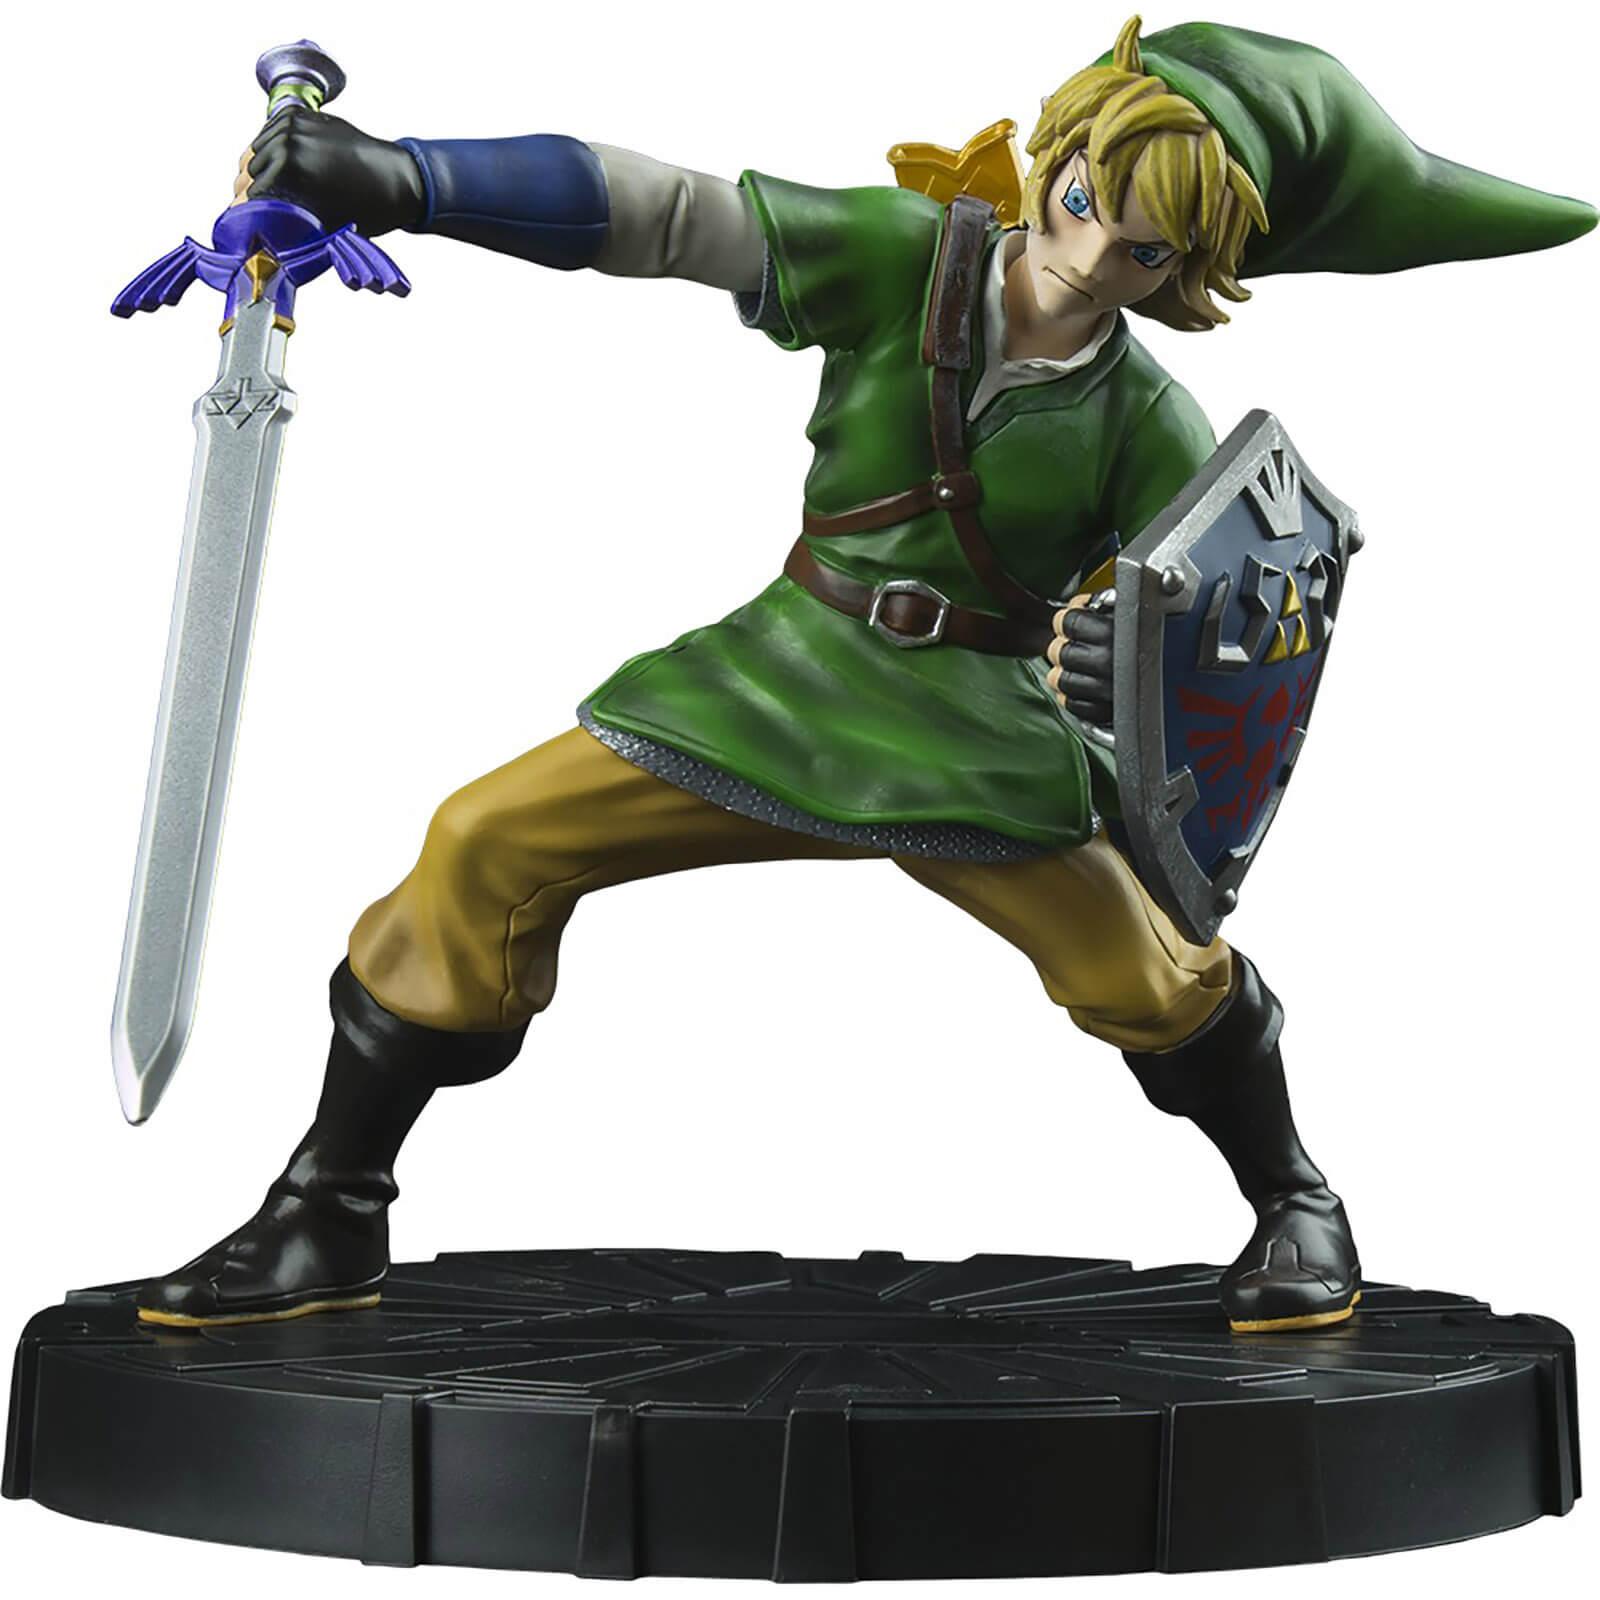 "Link Skyward Sword Statue 10"""